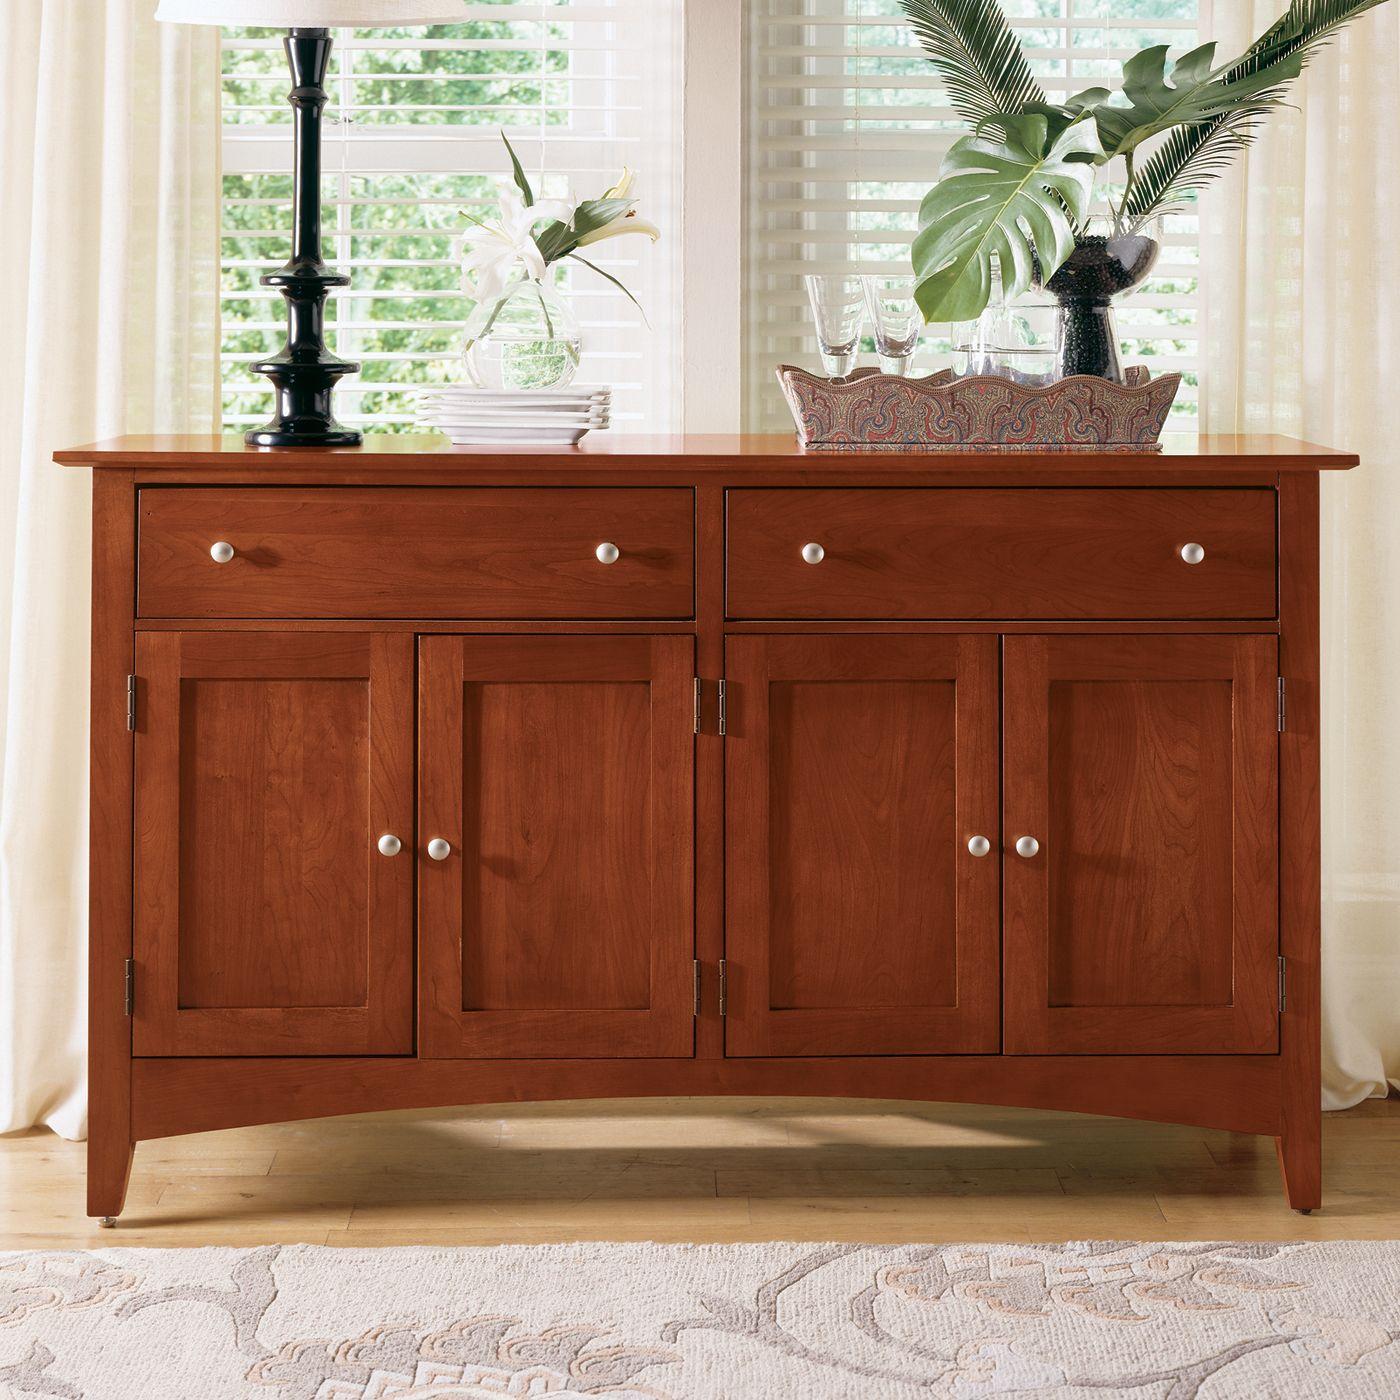 Kincaid Furniture 43 090 Gathering House Sideboard, Satin Regarding Newest Nashoba Sideboards (View 13 of 20)